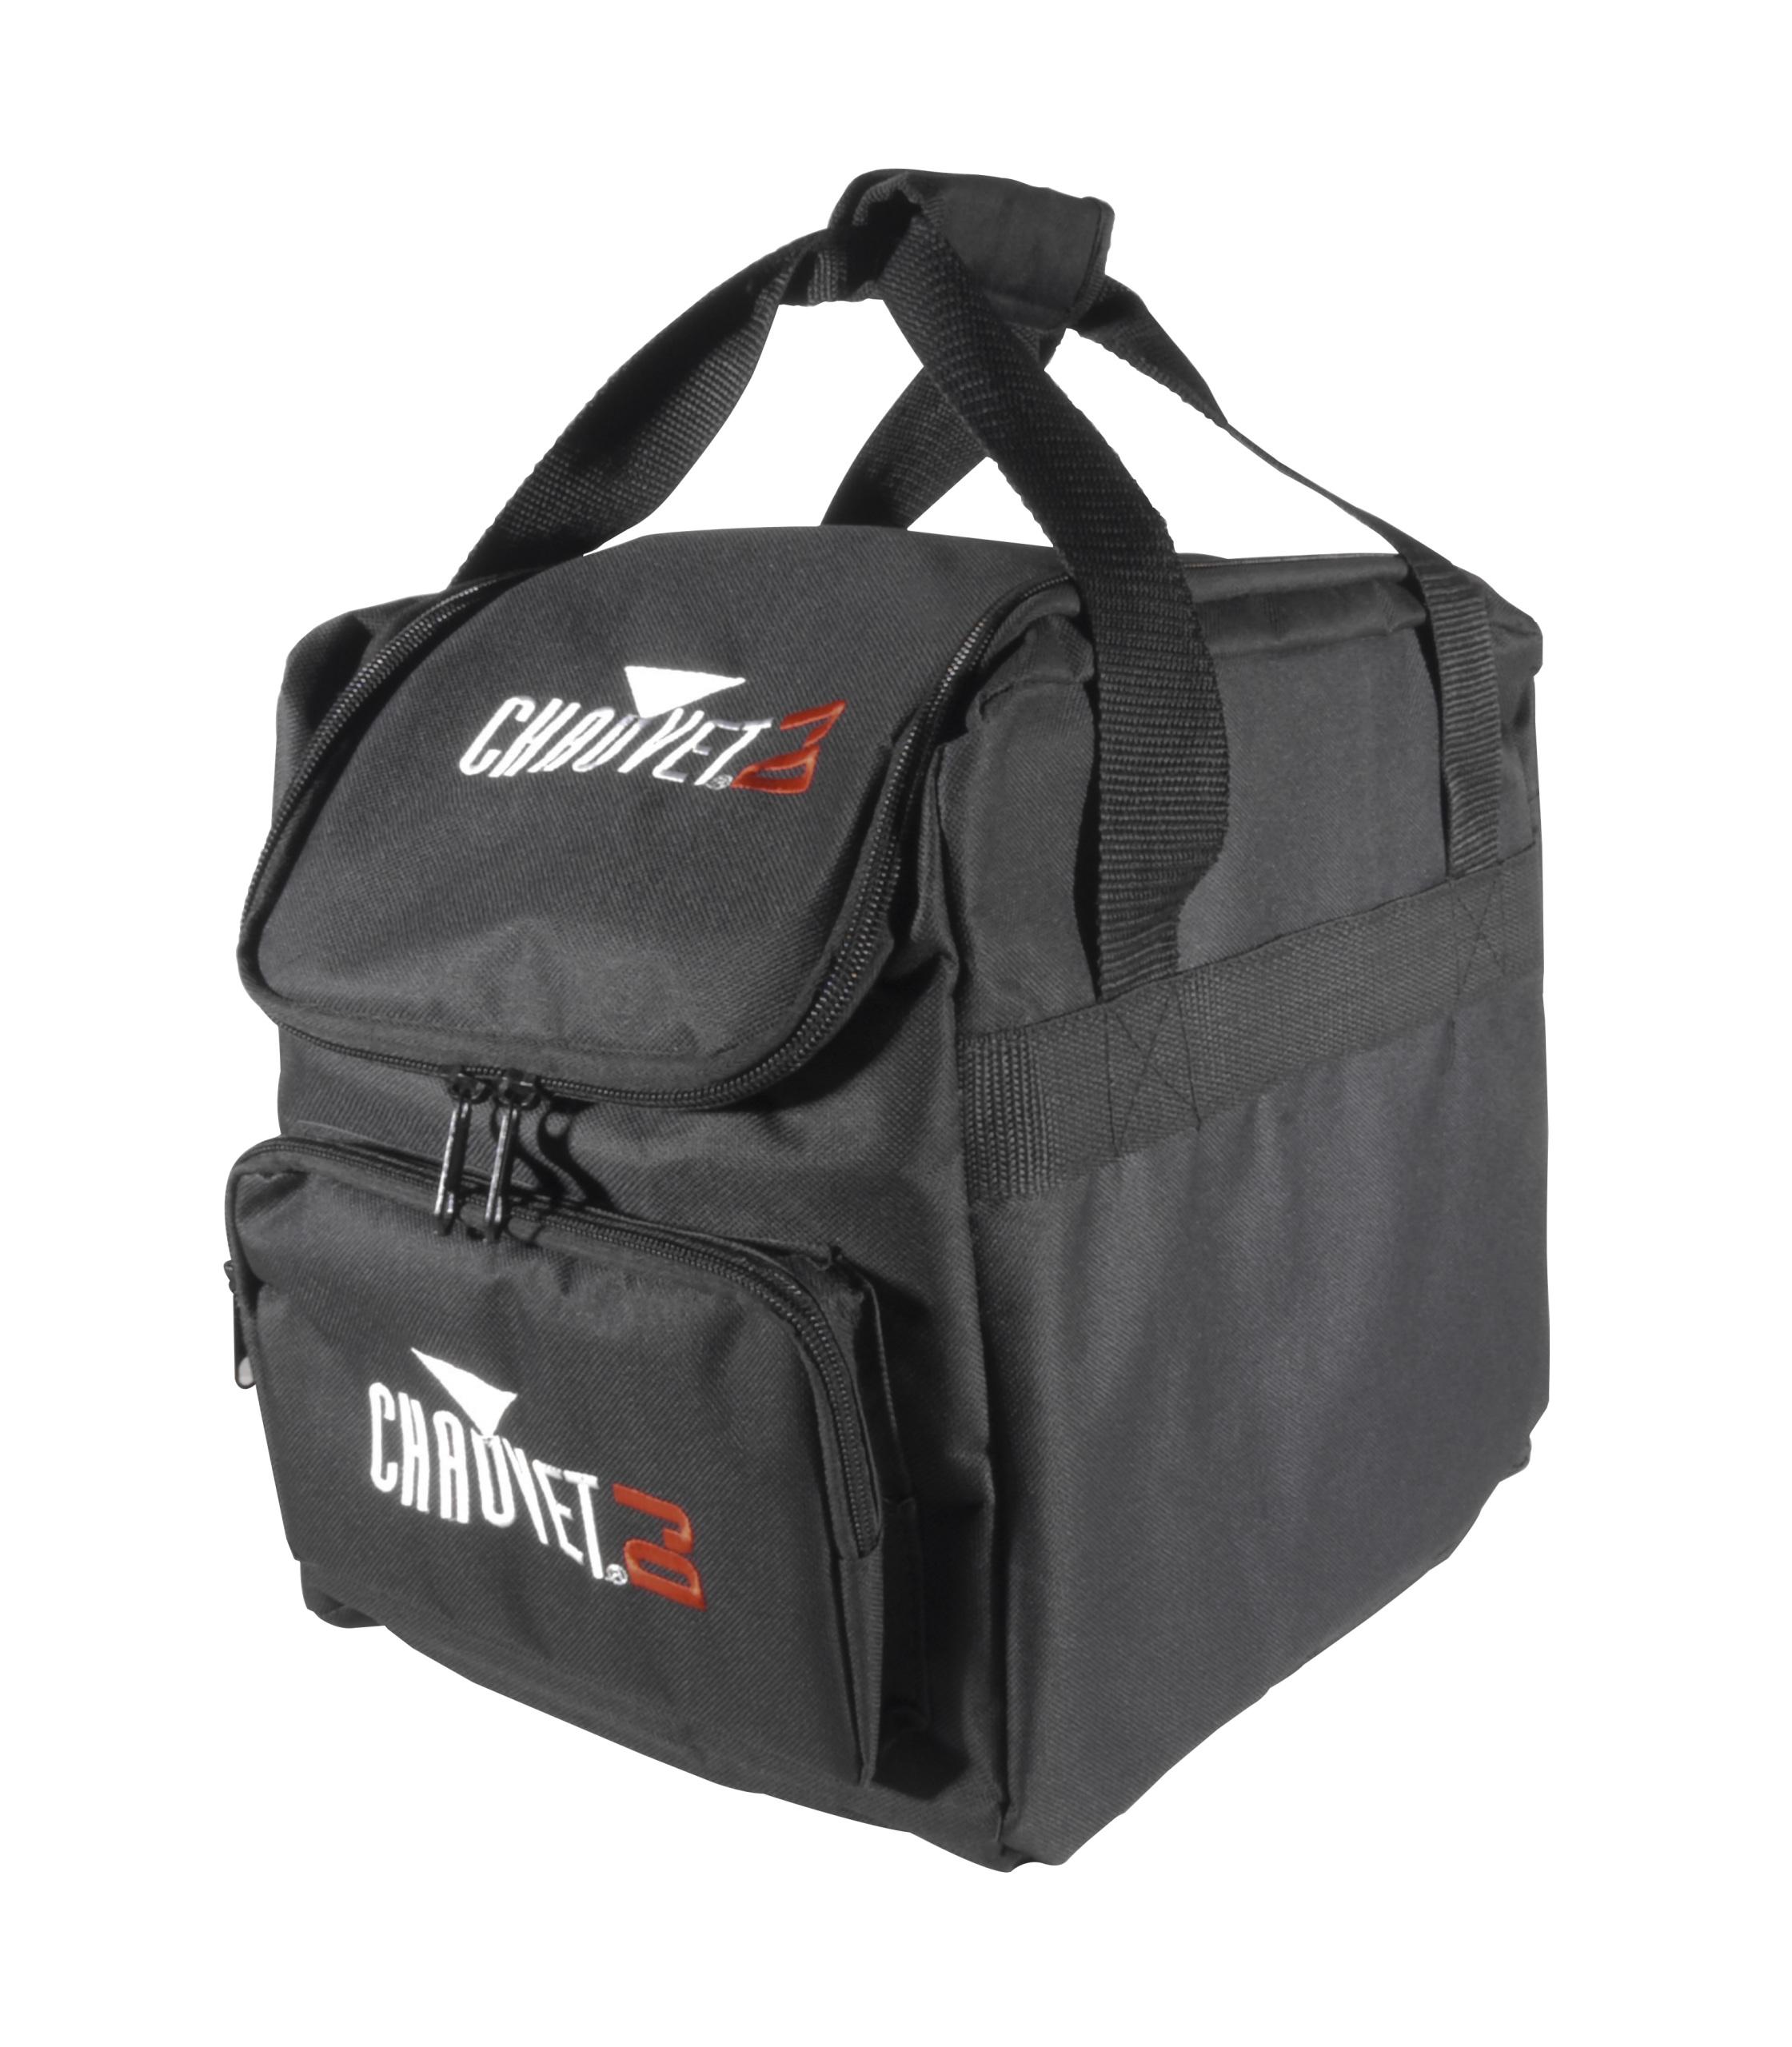 Chauvet CHS-25 VIP Light Gear Bag